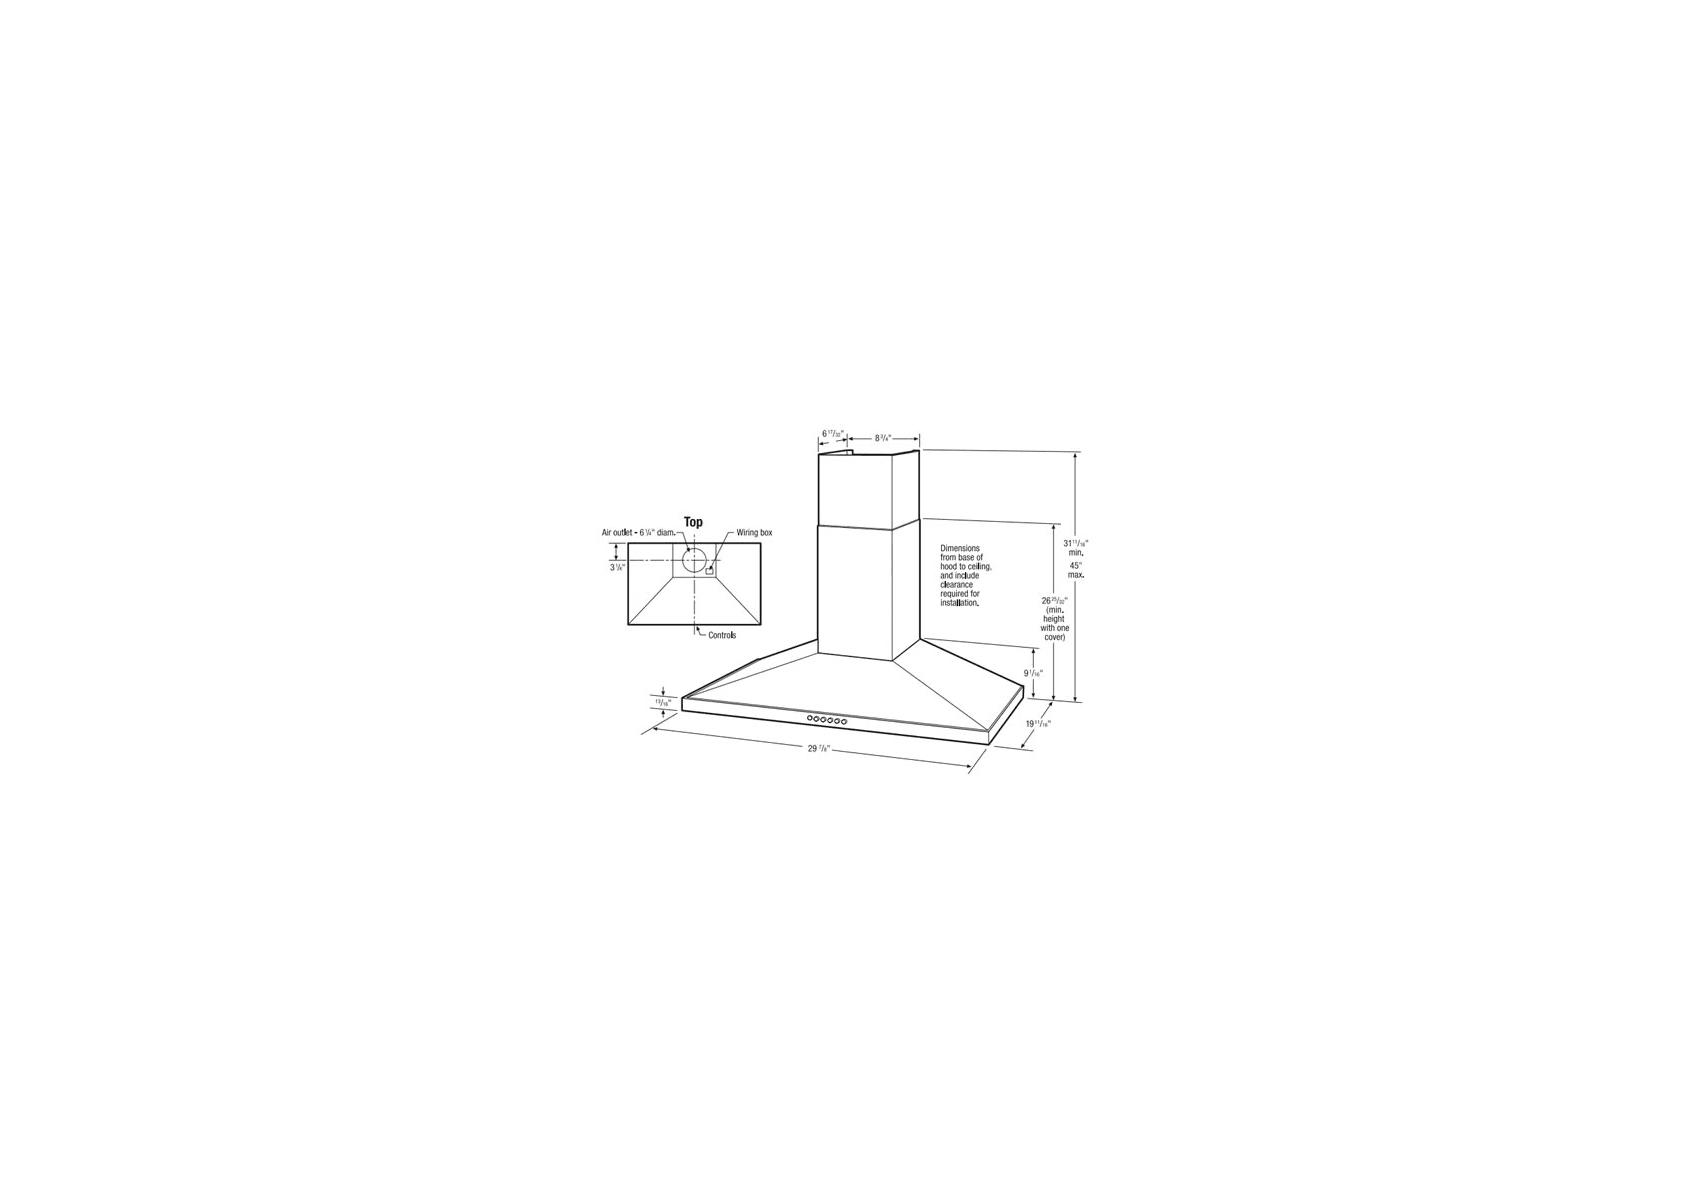 Frigidaire Wall Mounted Range Hood Fhwc3055l Kegerator Wiring Diagram